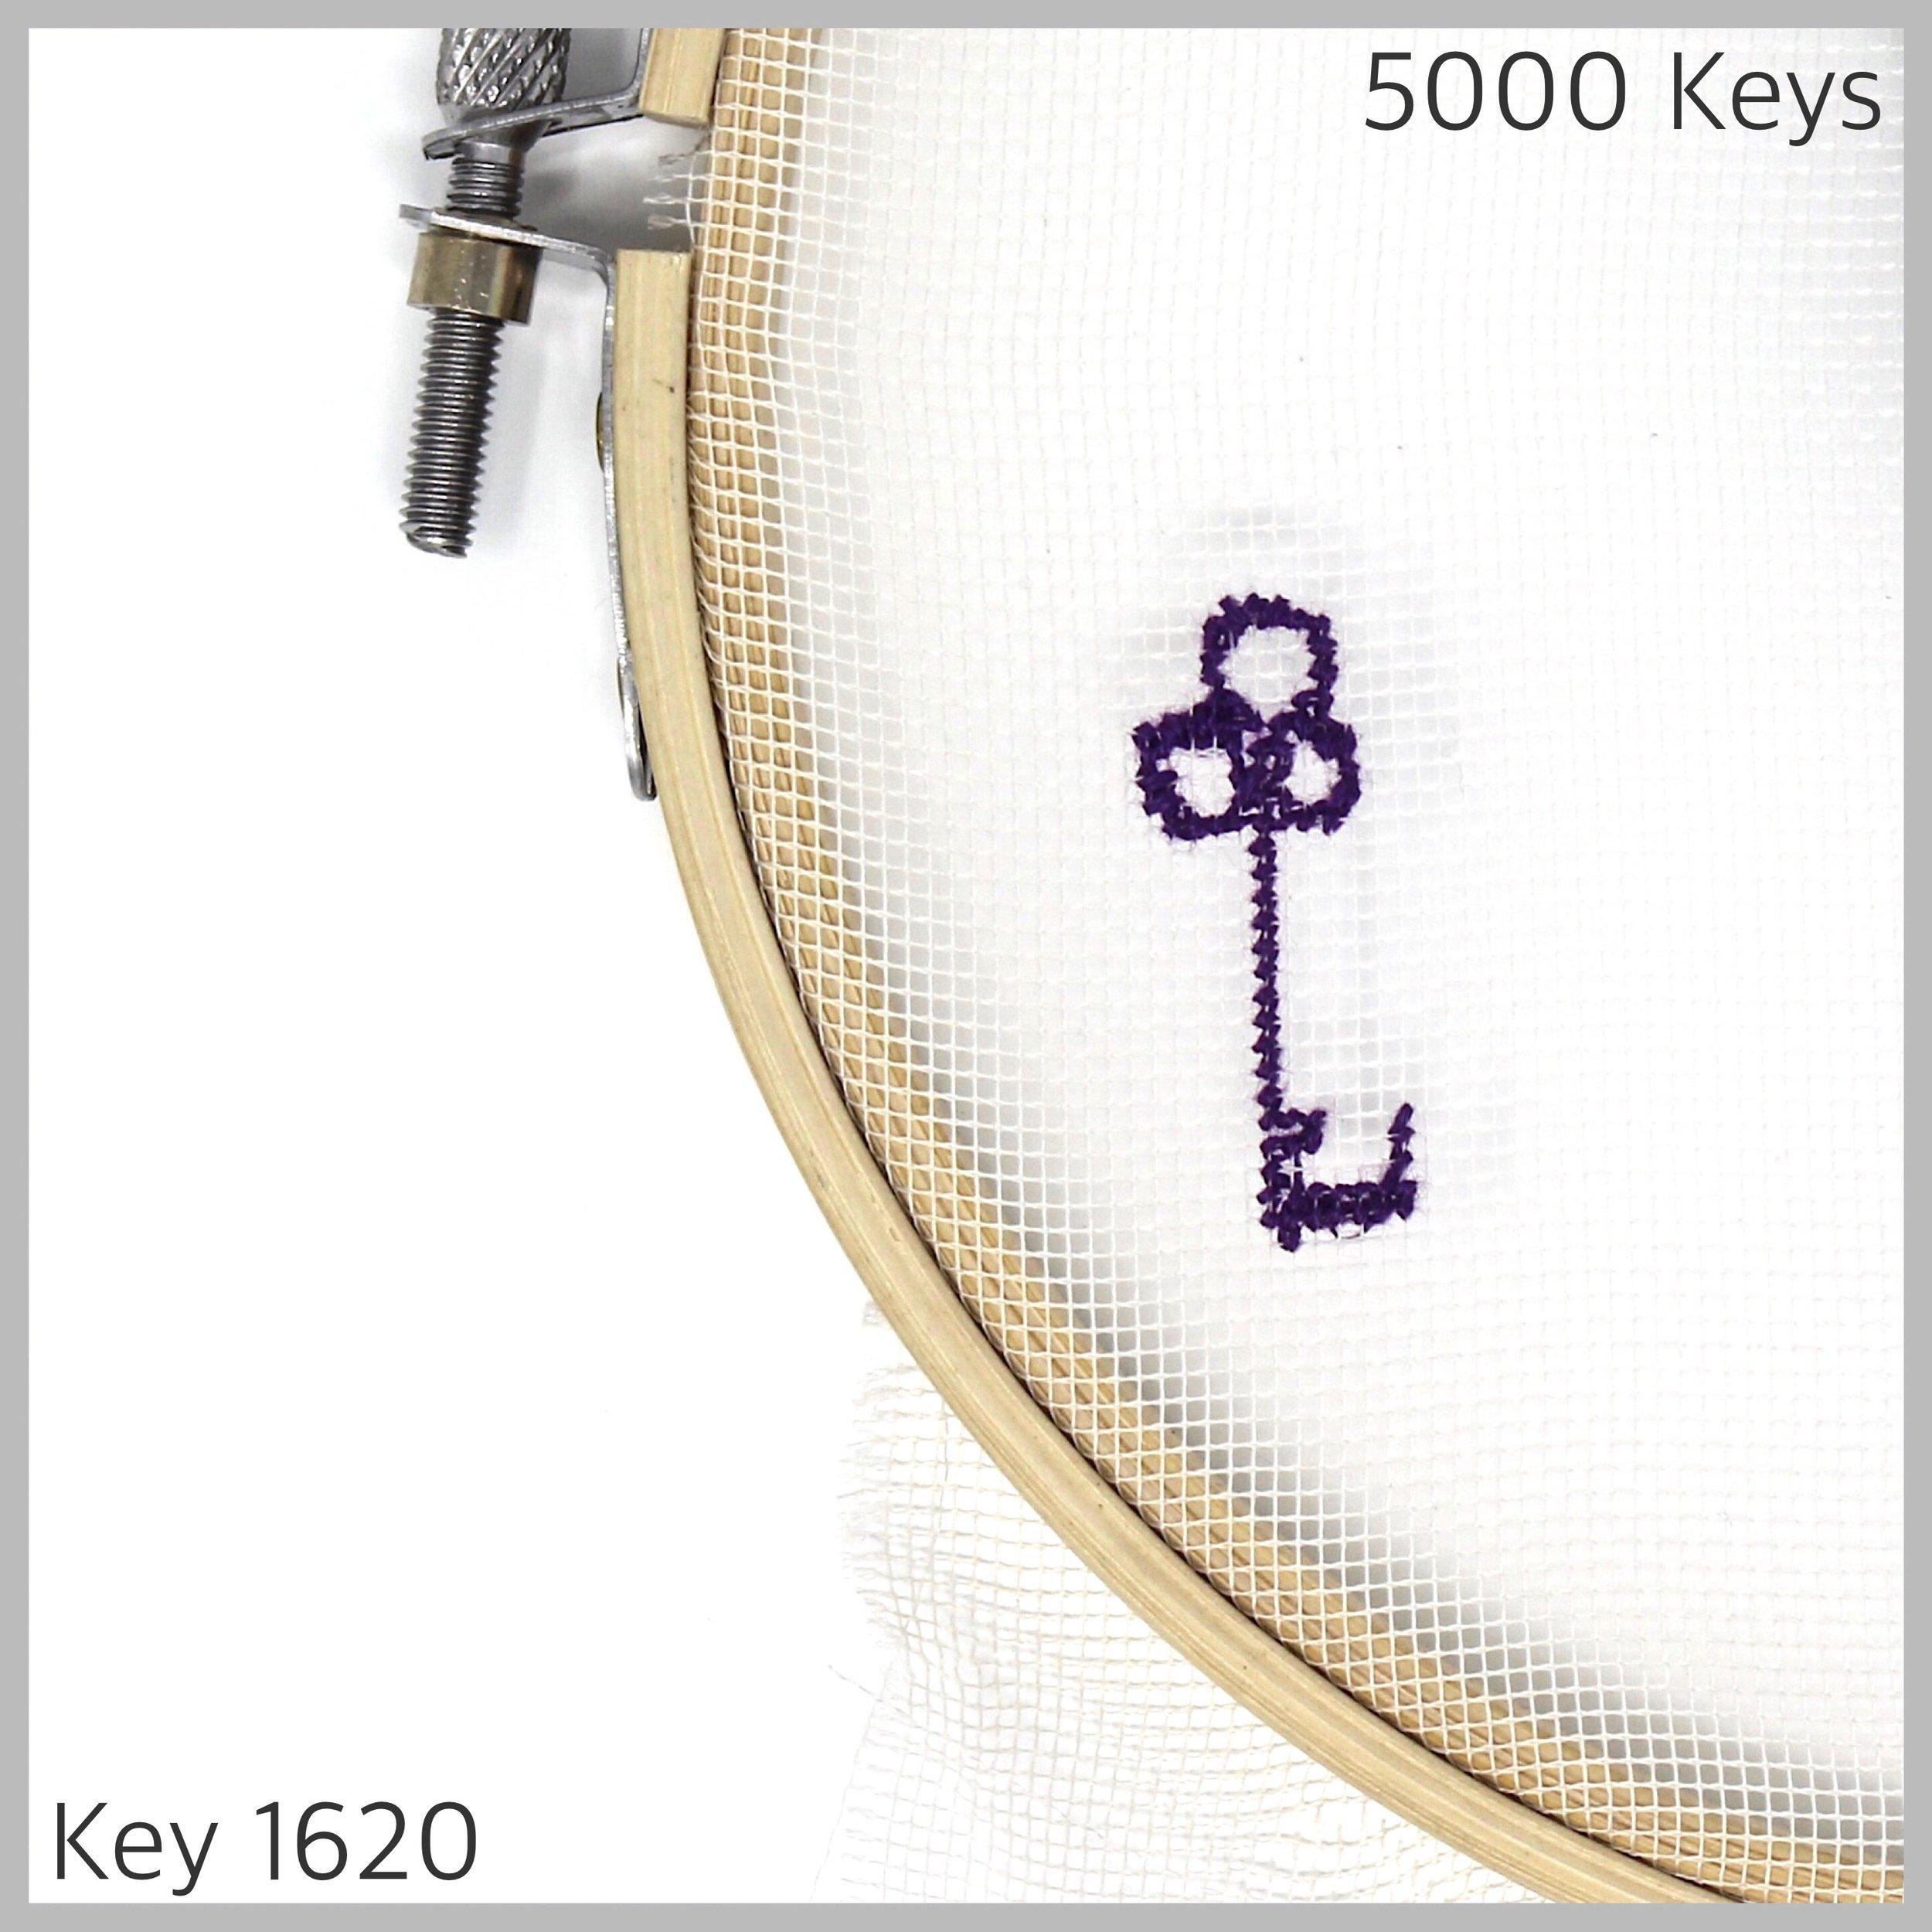 Key 1620 - 1.JPG